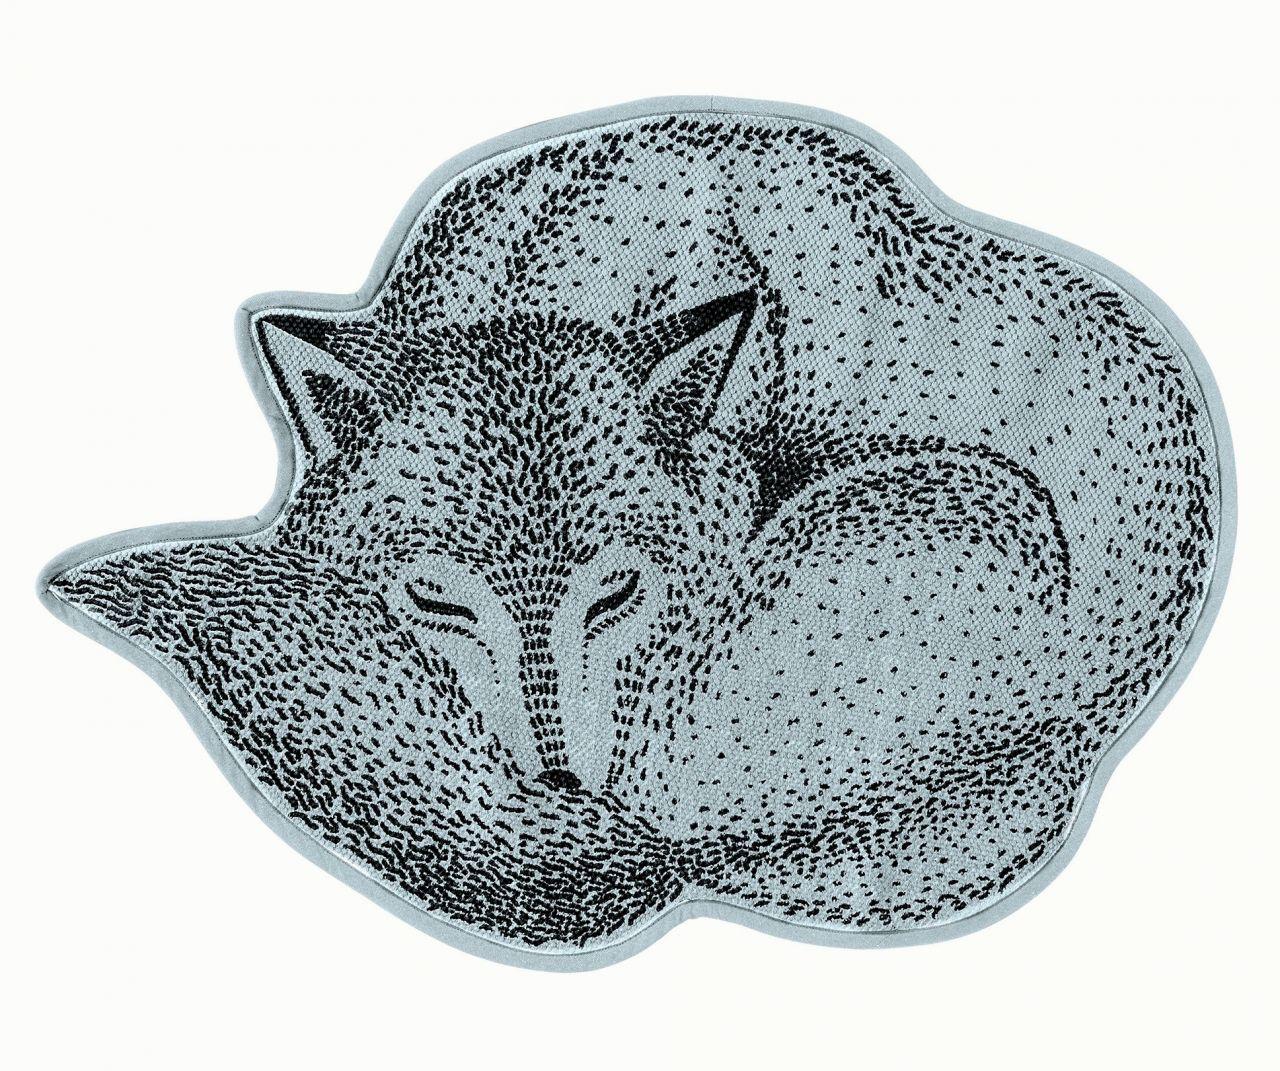 Kobereček do dětského pokoje ve tvaru lišky Fox Sky blue